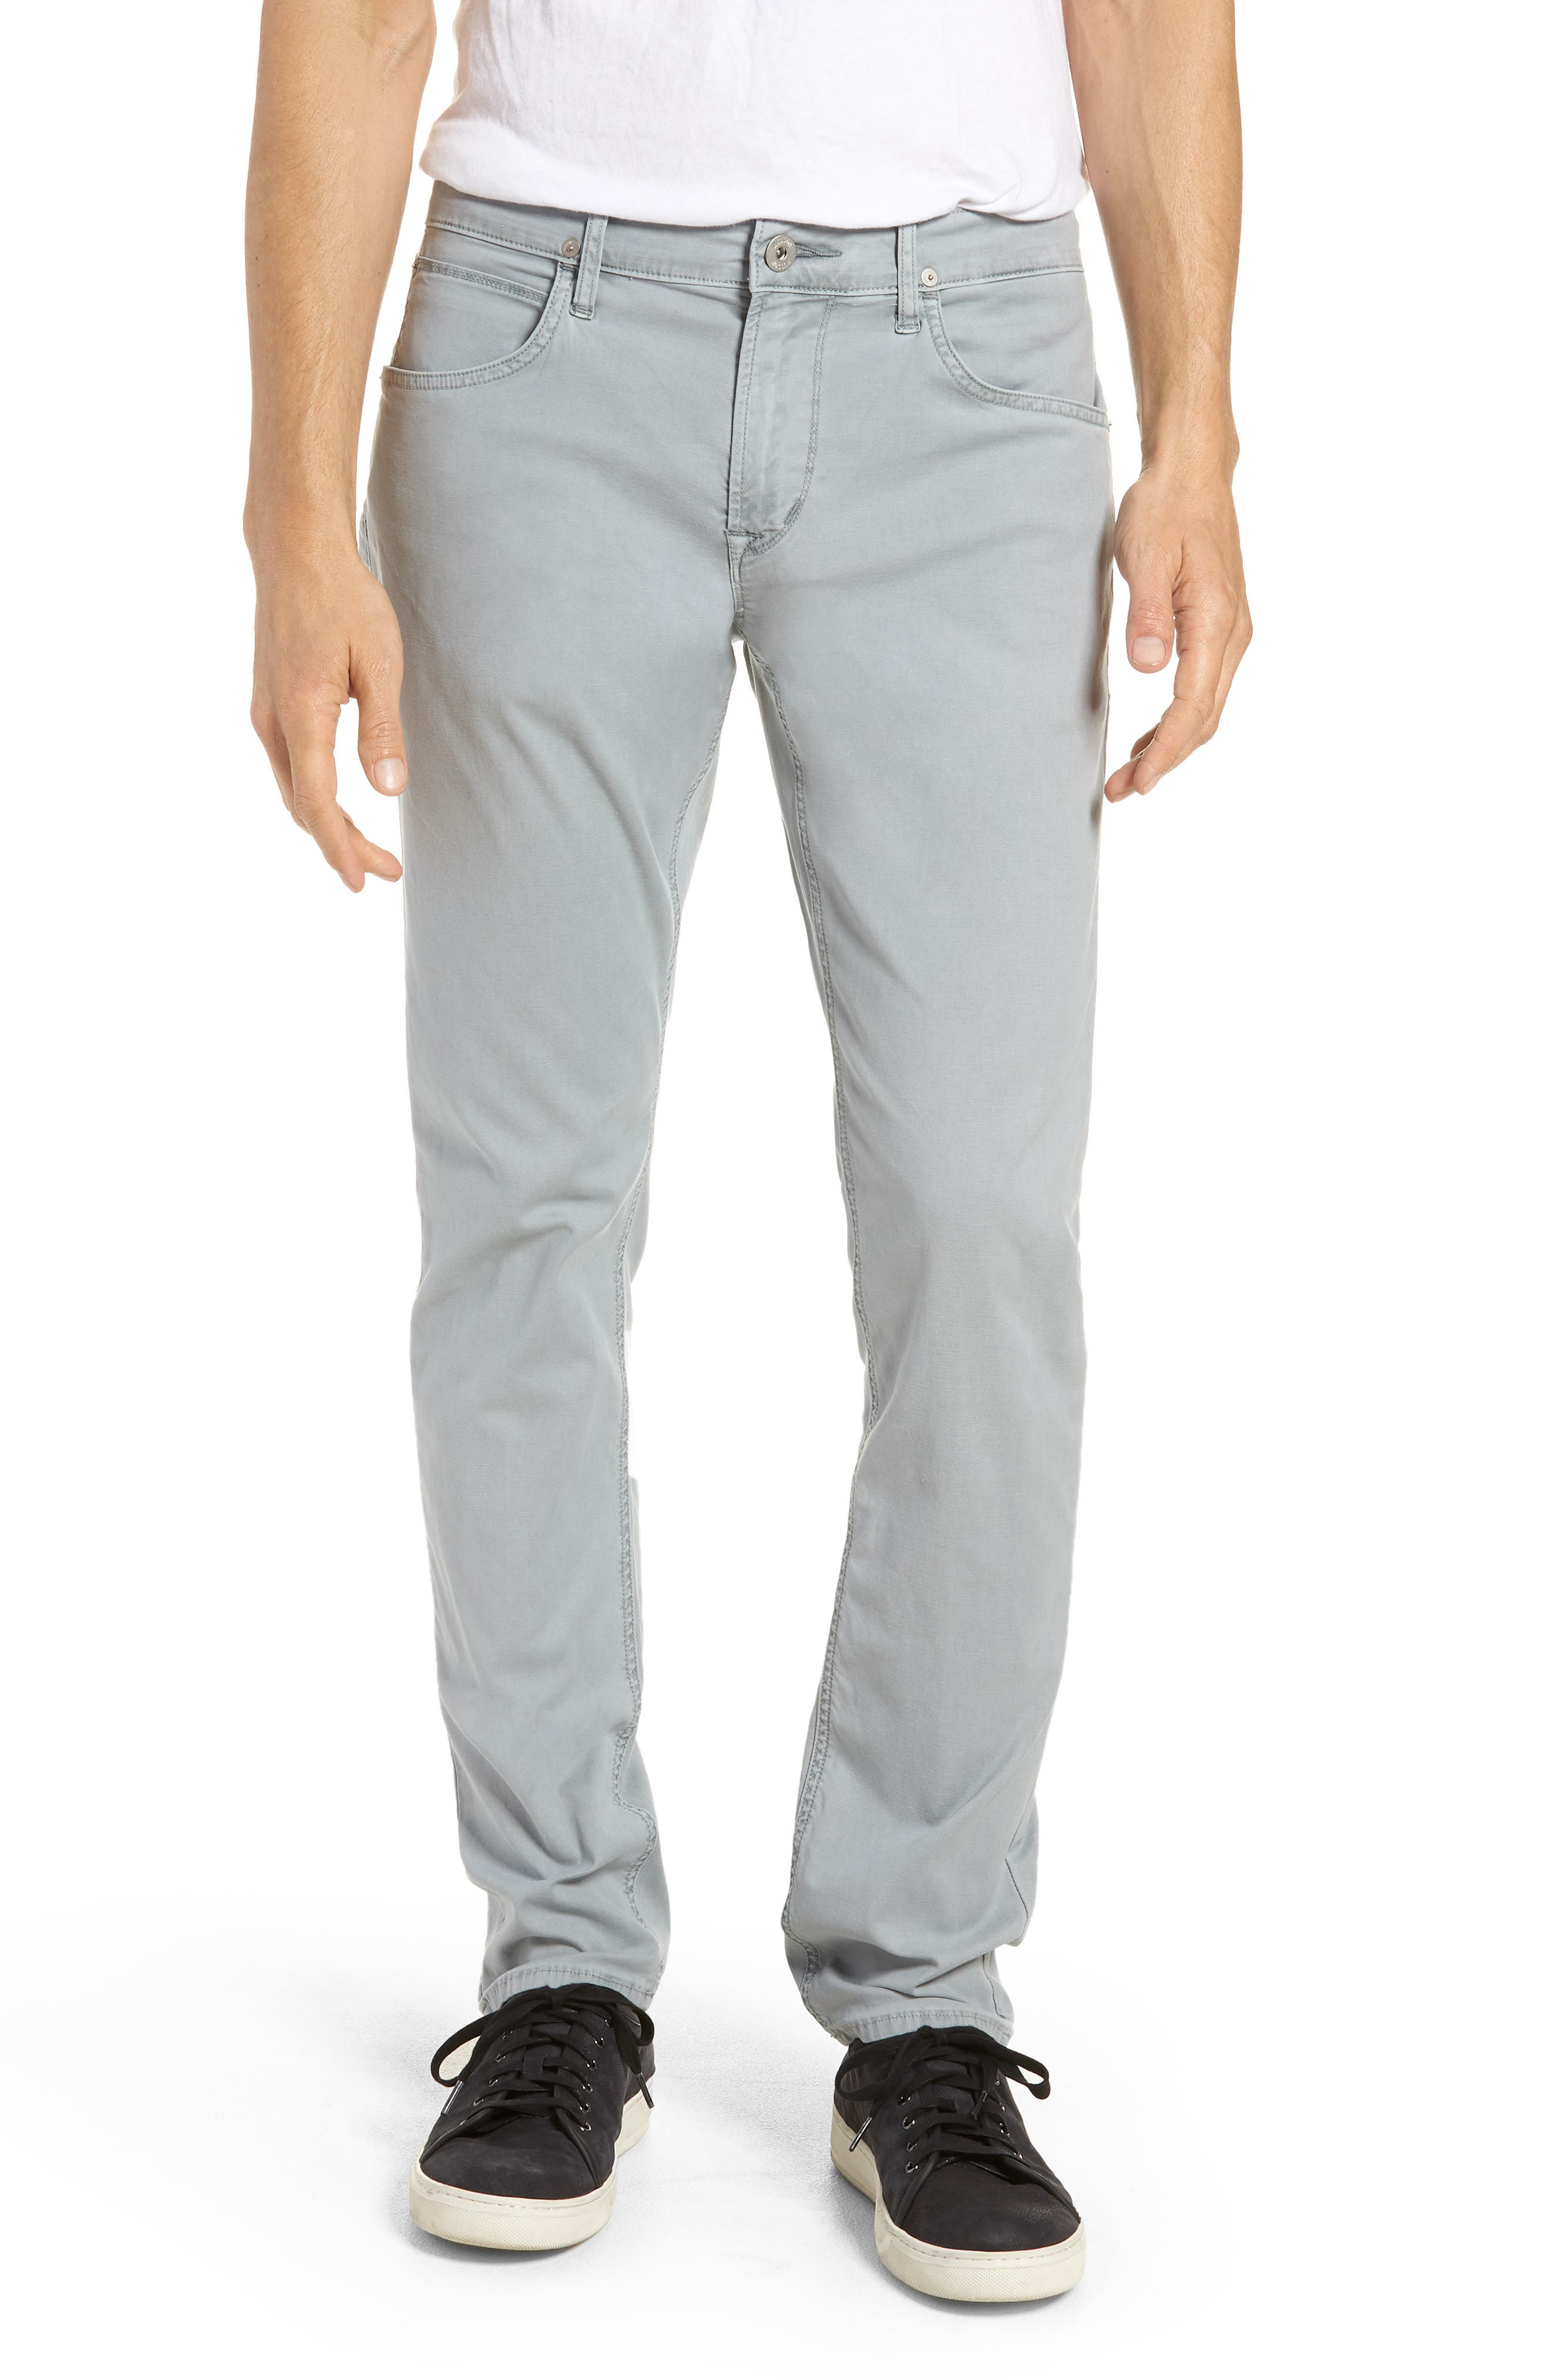 Blake Slim Fit Jeans,                         Main,                         color, Steel Blue